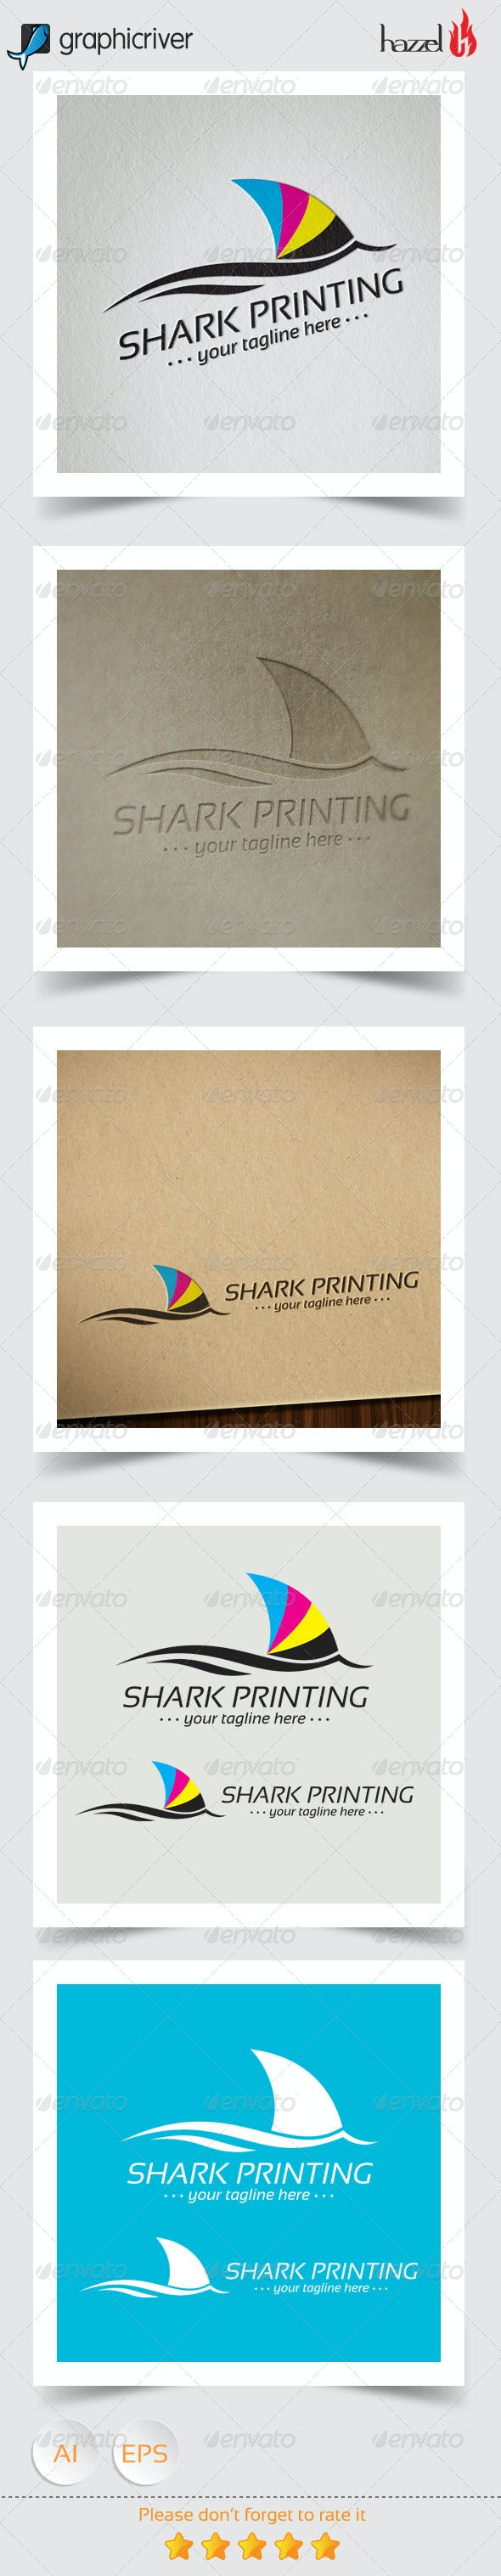 Shark Printing Logo - Animals Logo Templates